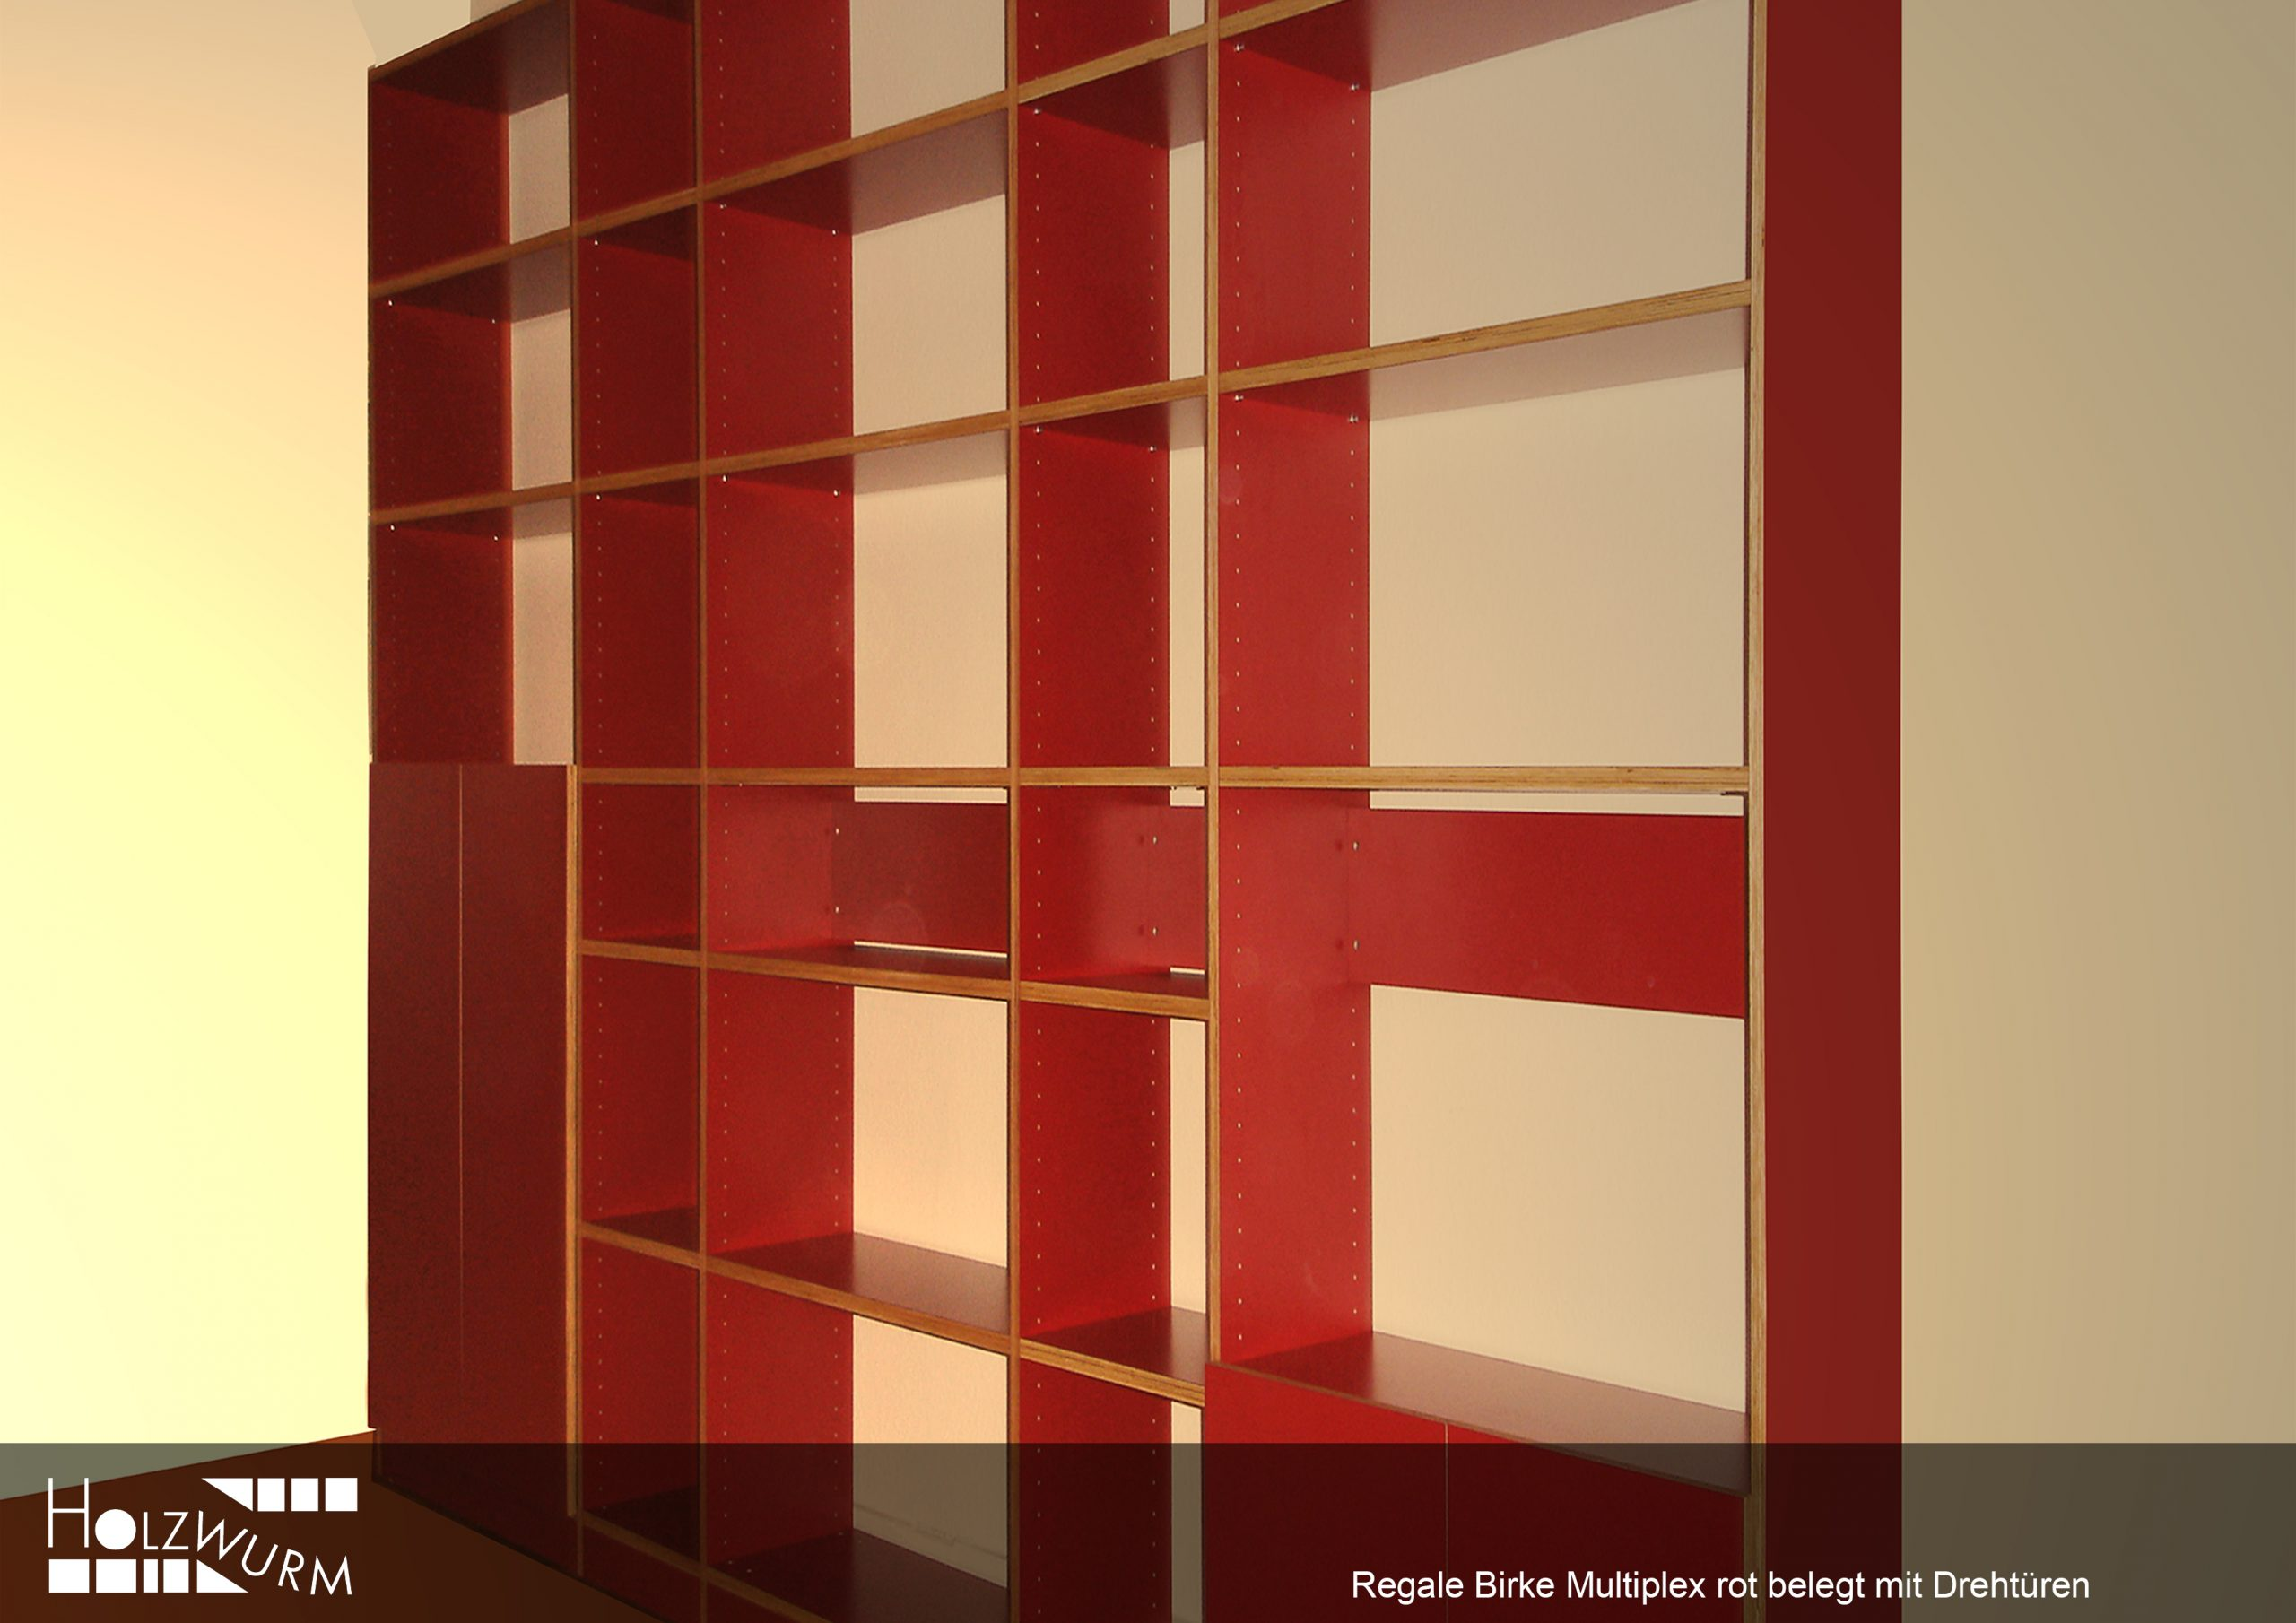 Regal Birke Multiplex rot belegt mit Drehtüren.